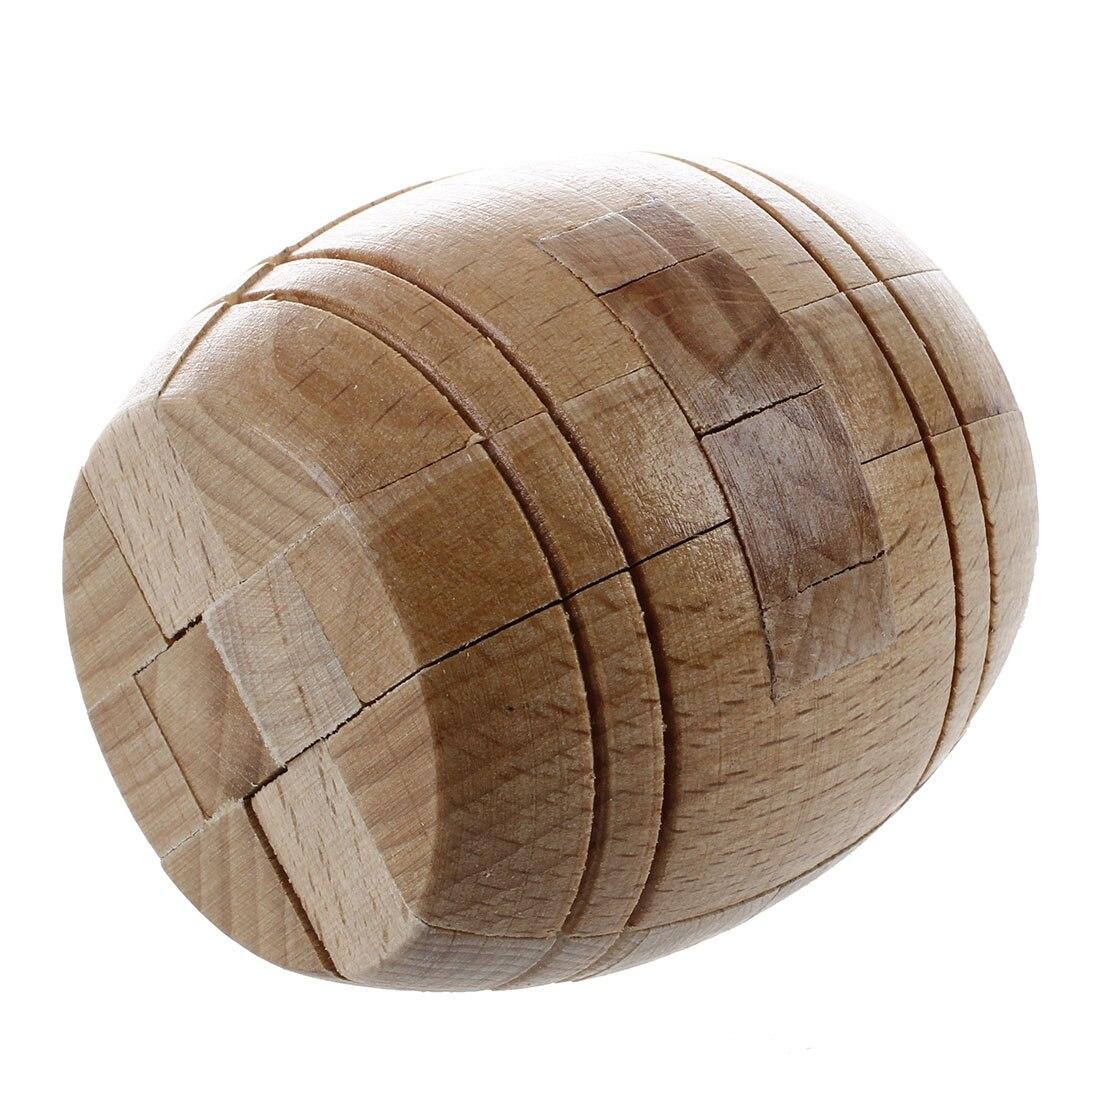 Juguete rompecabezas de cubo con cerradura de madera WOTT Kongming Luban